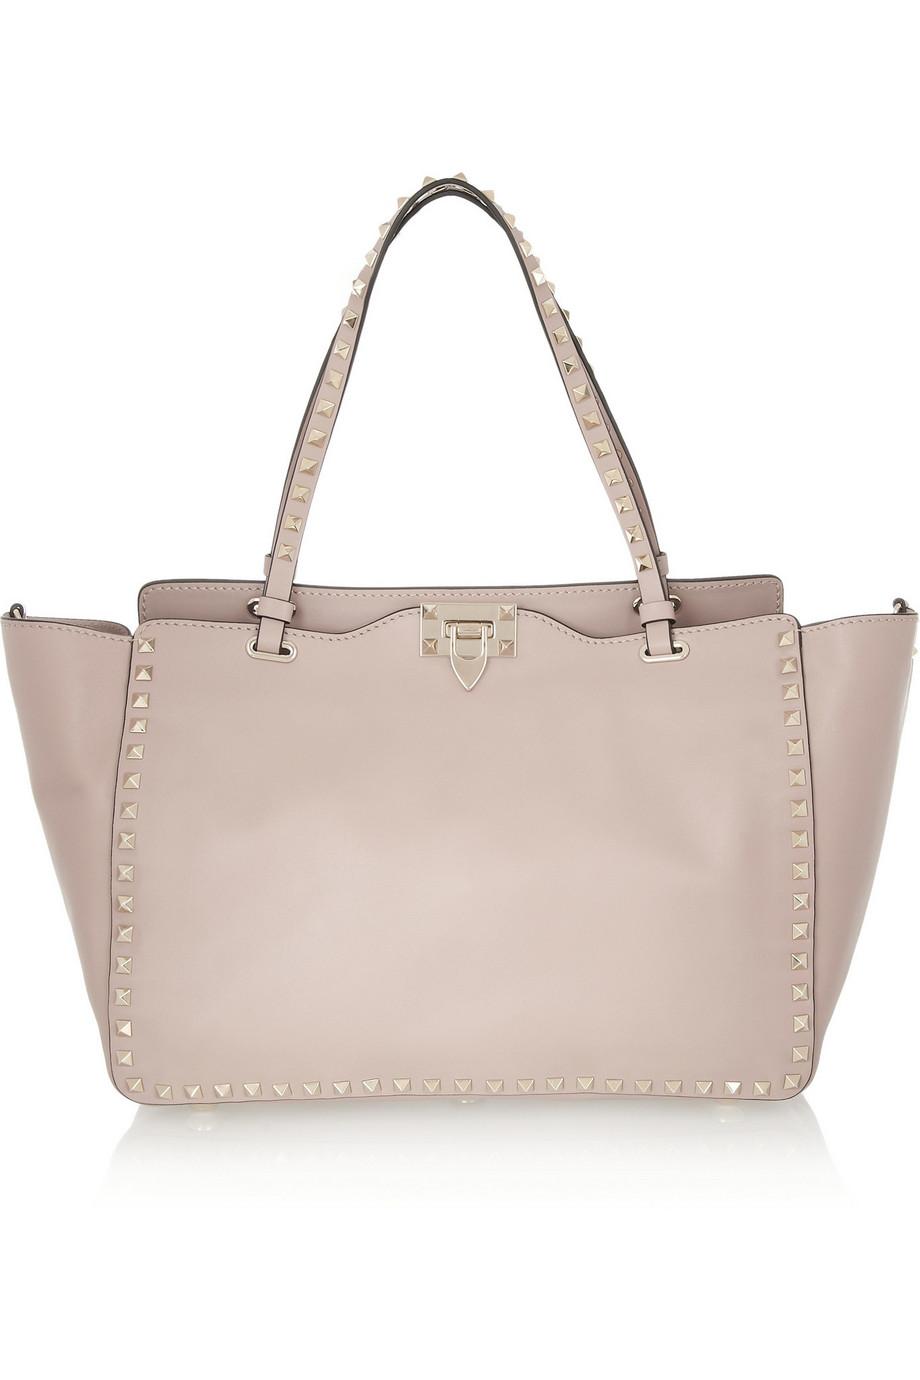 Valentino The Rockstud Medium Leather Trapeze Bag, Blush, Women's